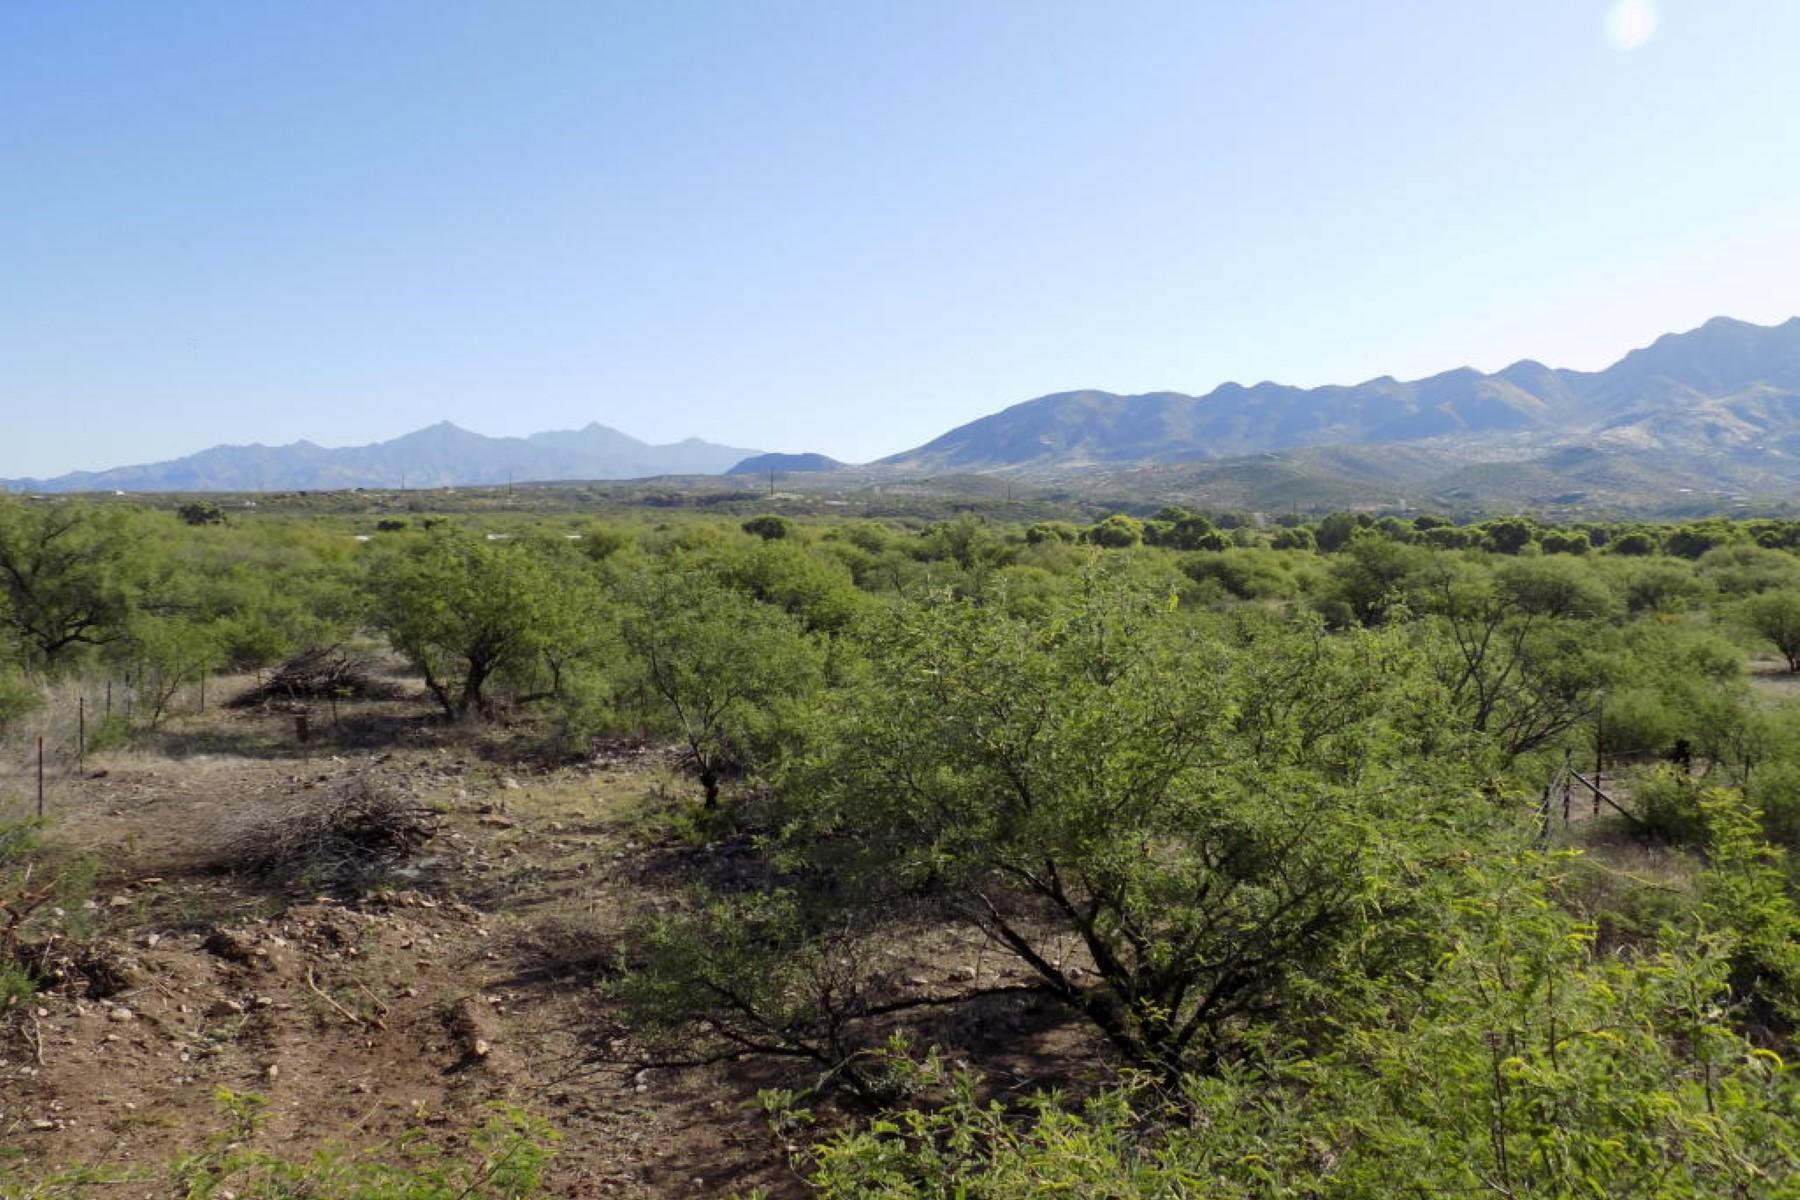 Land for Sale at Interchange parcel adjoin TBD PALO PARADO INTERCHANGE Rio Rico, Arizona, 85648 United States